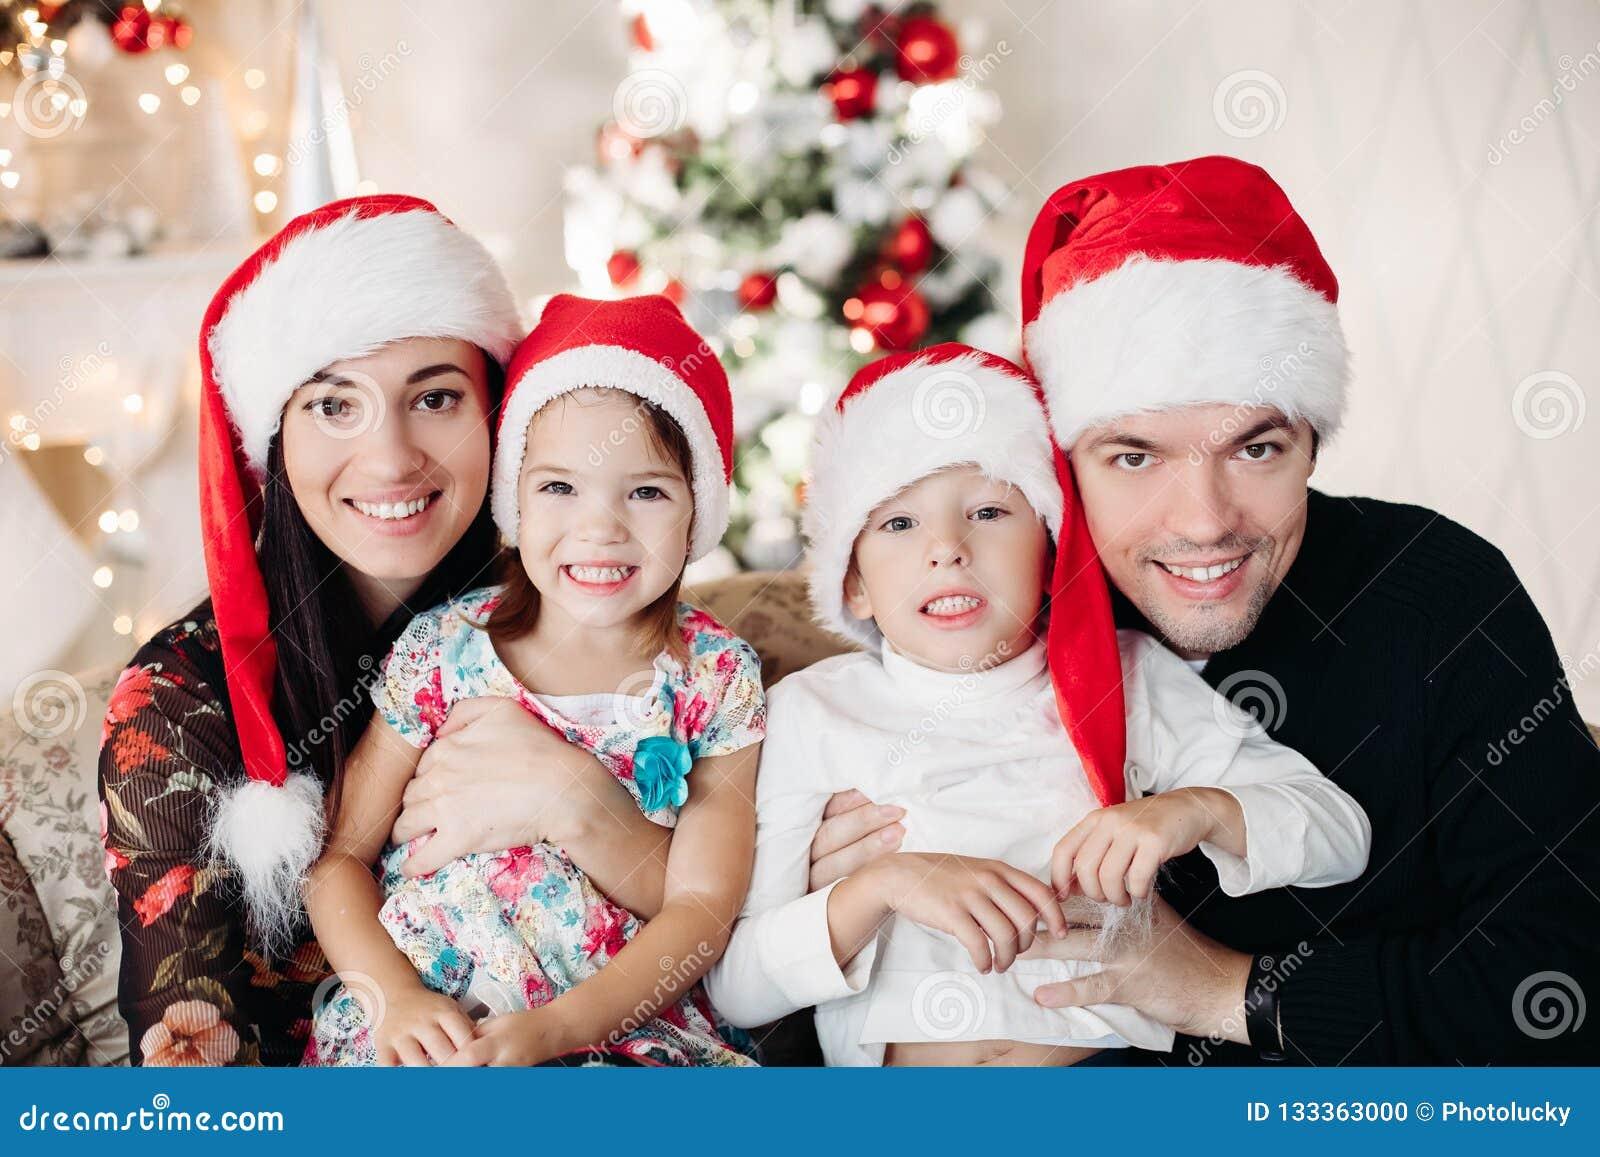 Beautiful happy caucasian family. Portrait of happy loving siblings